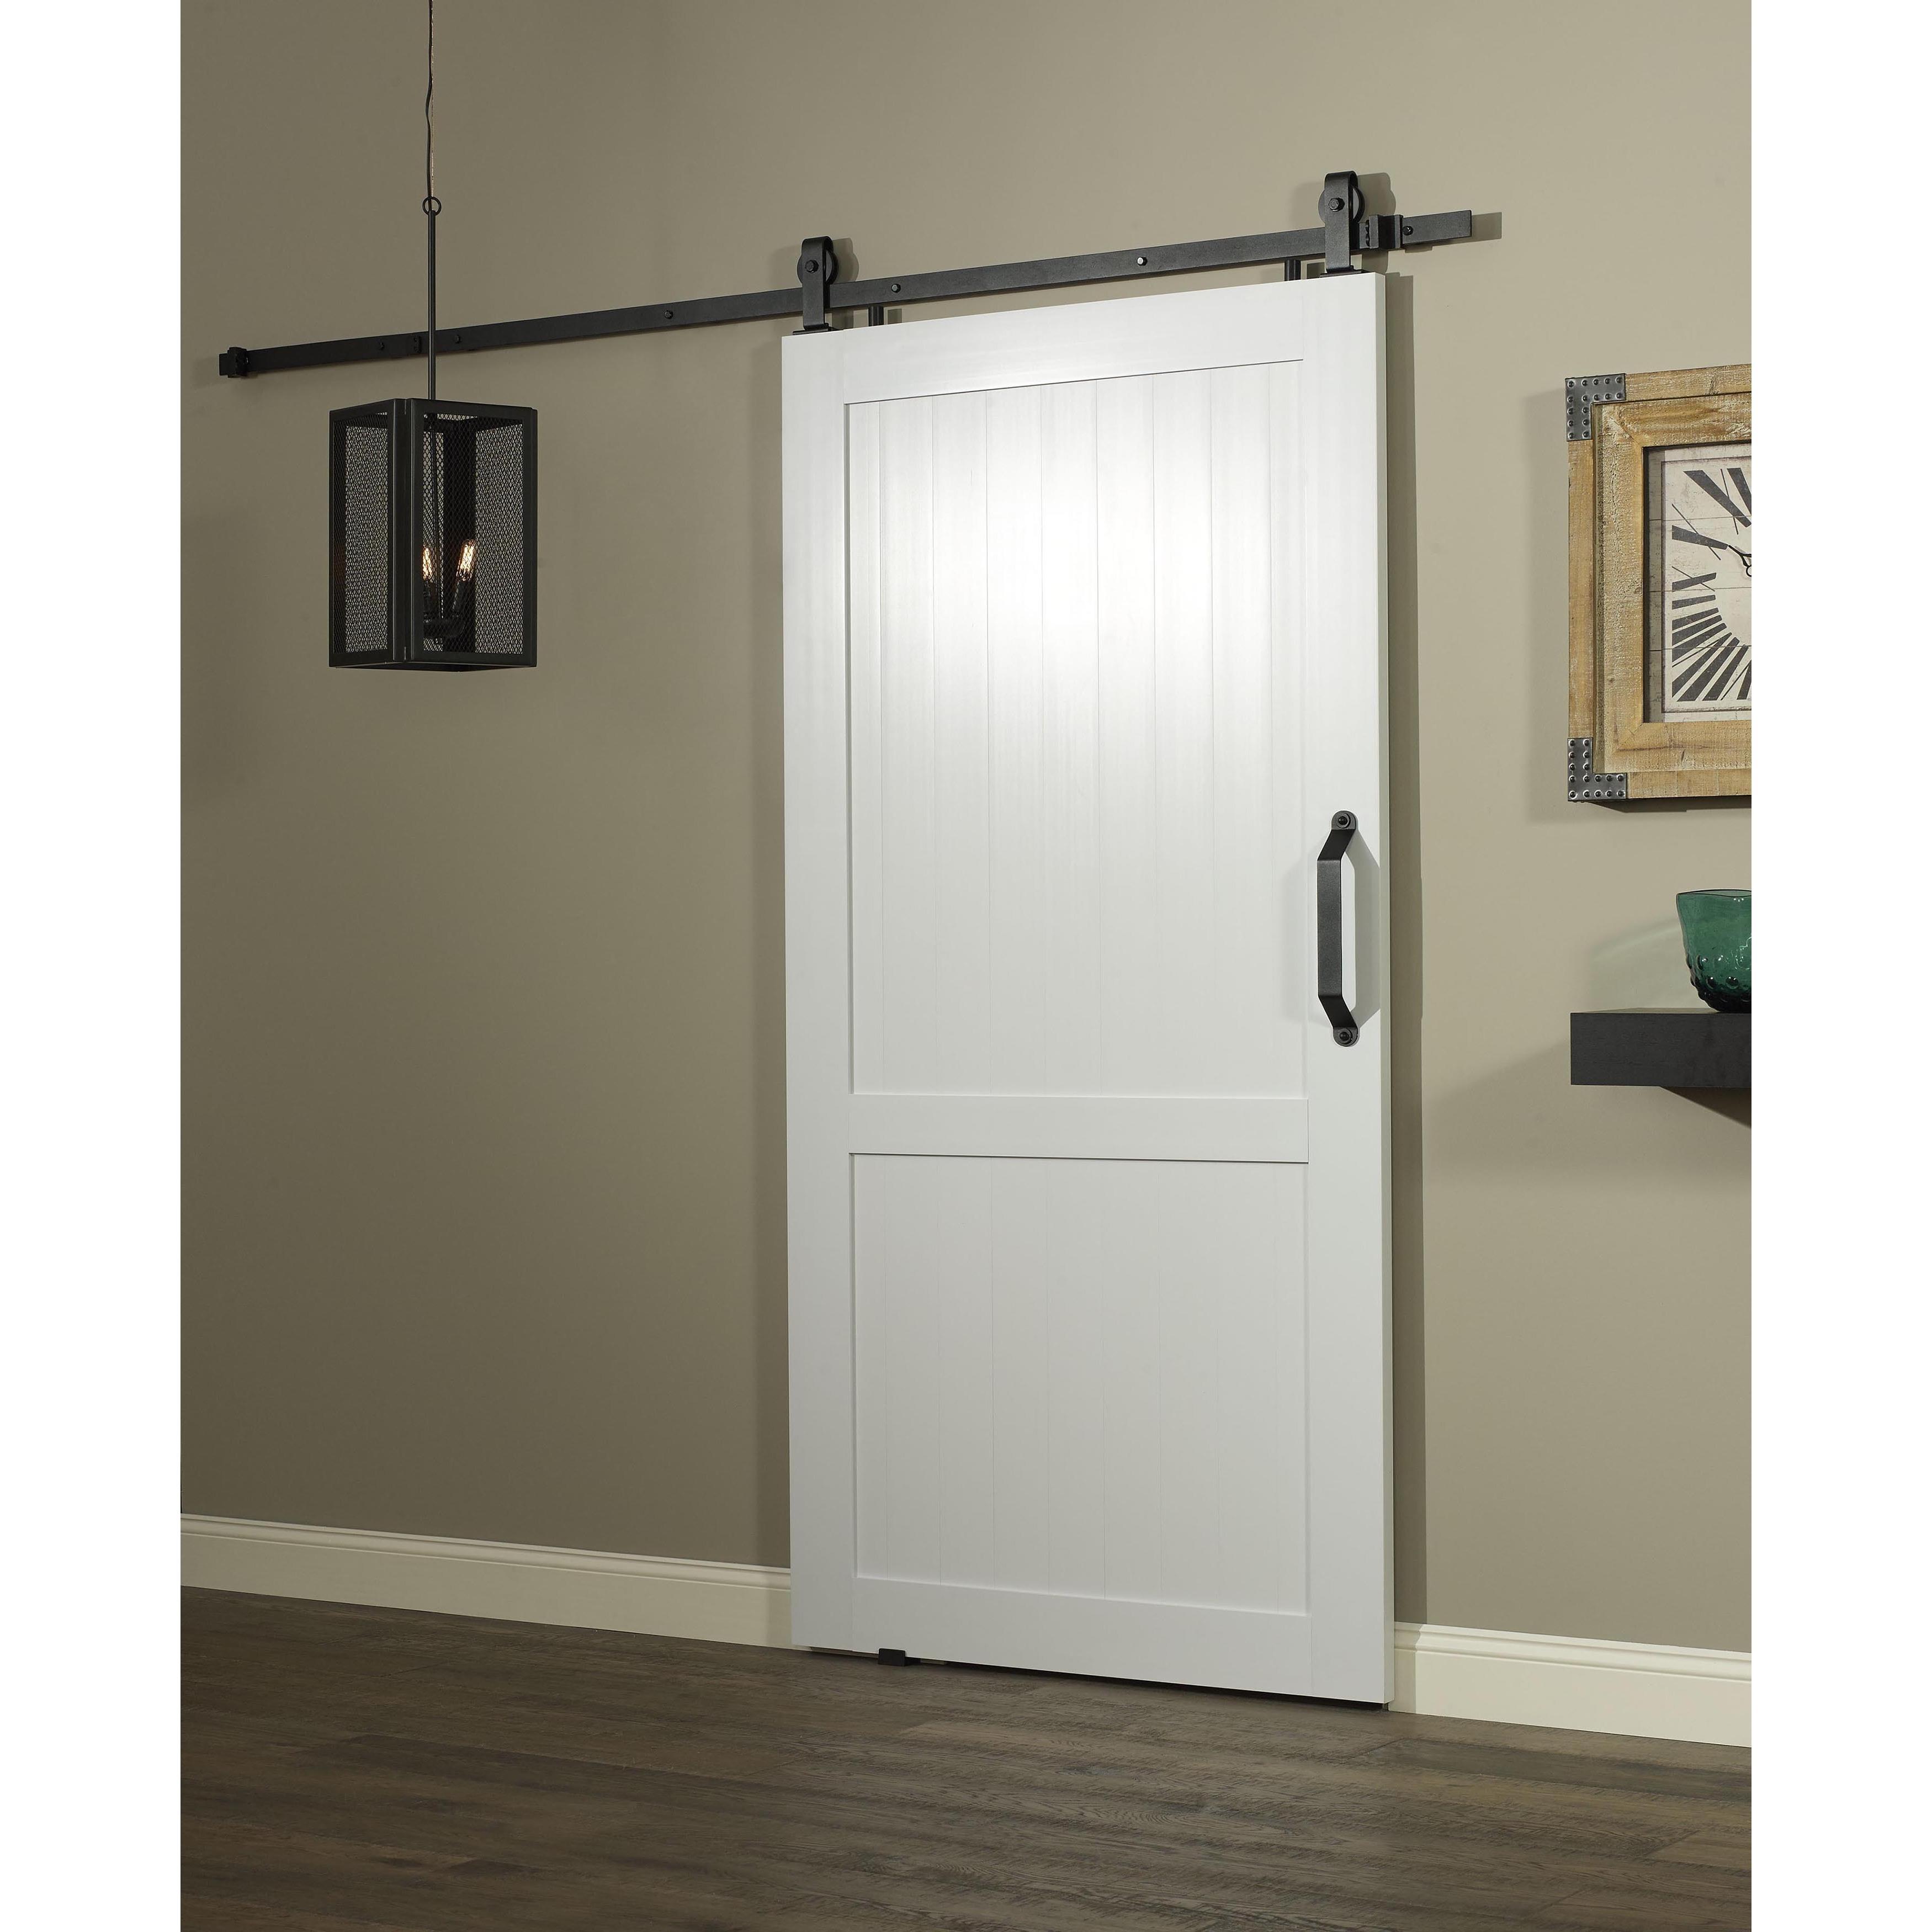 Shop Millbrooke Barn Pvc And Metal 42 Inch H Style Sliding Door